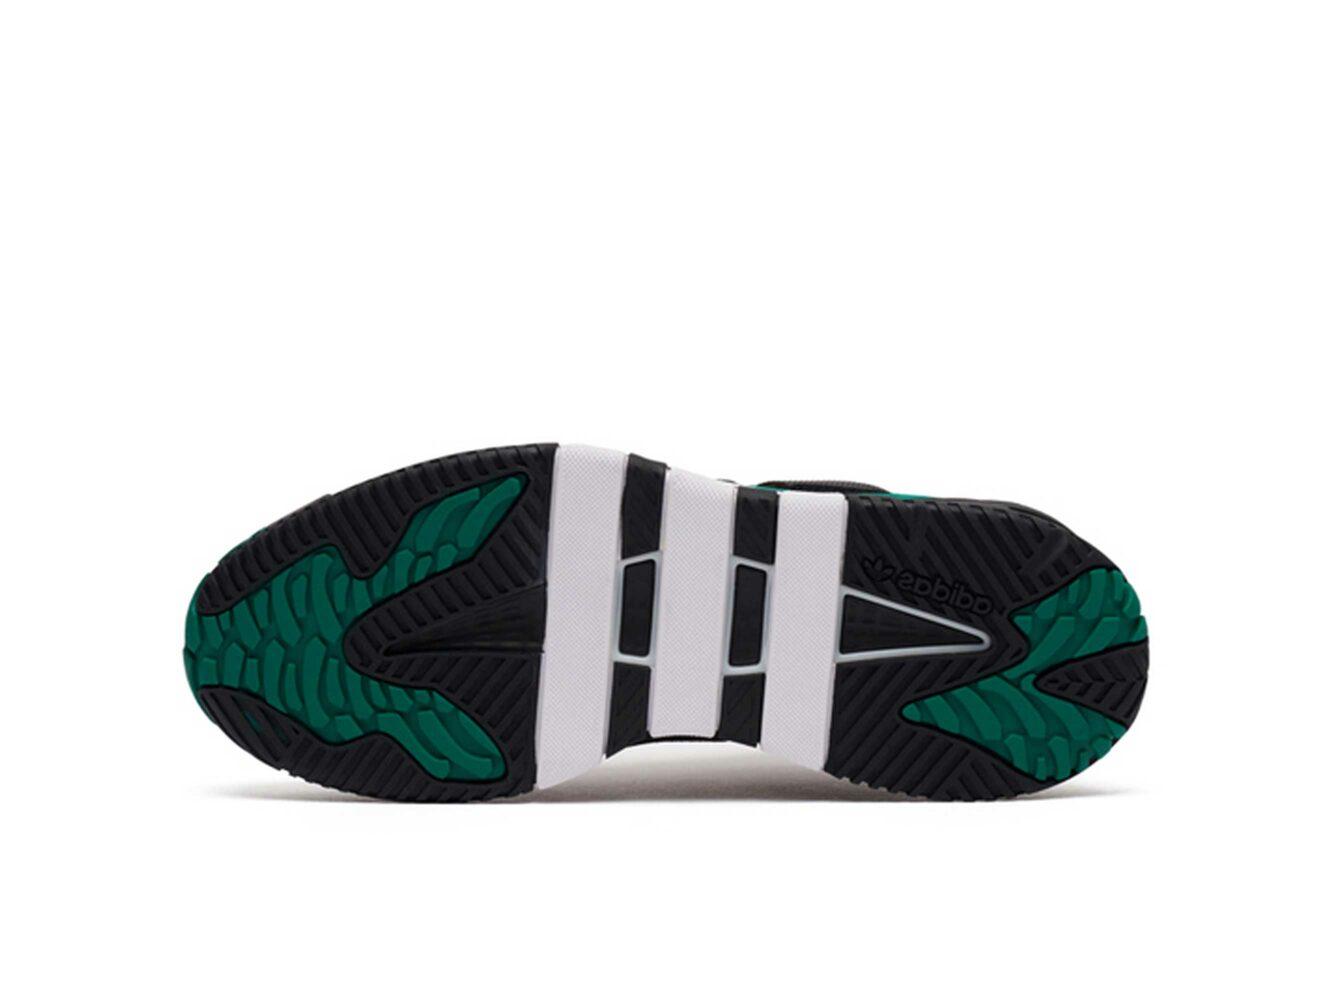 adidas niteball black green FW2477 купить